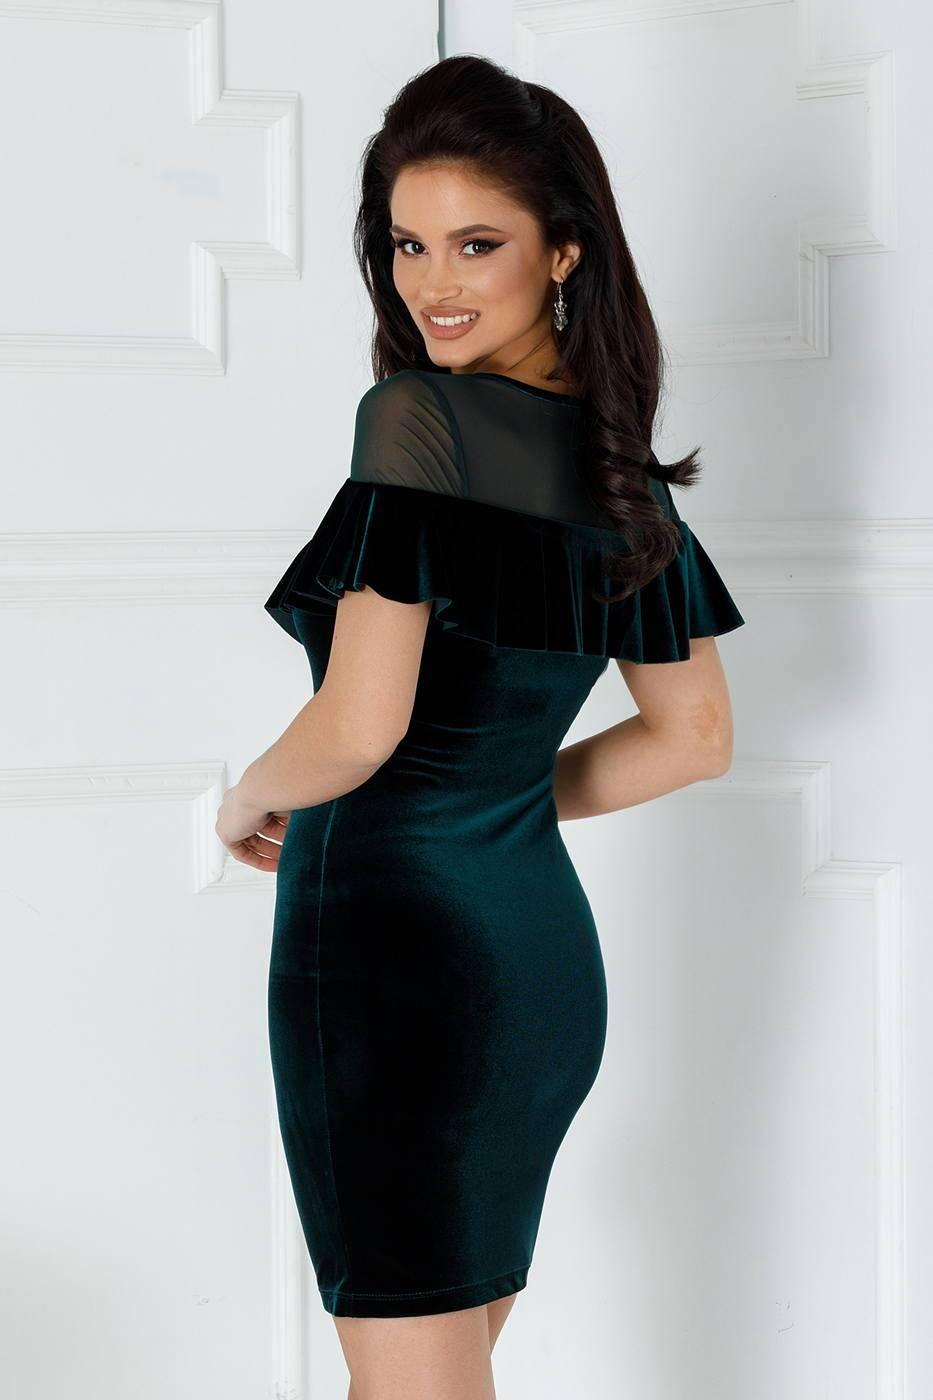 Karim Πράσινο Φόρεμα 2222